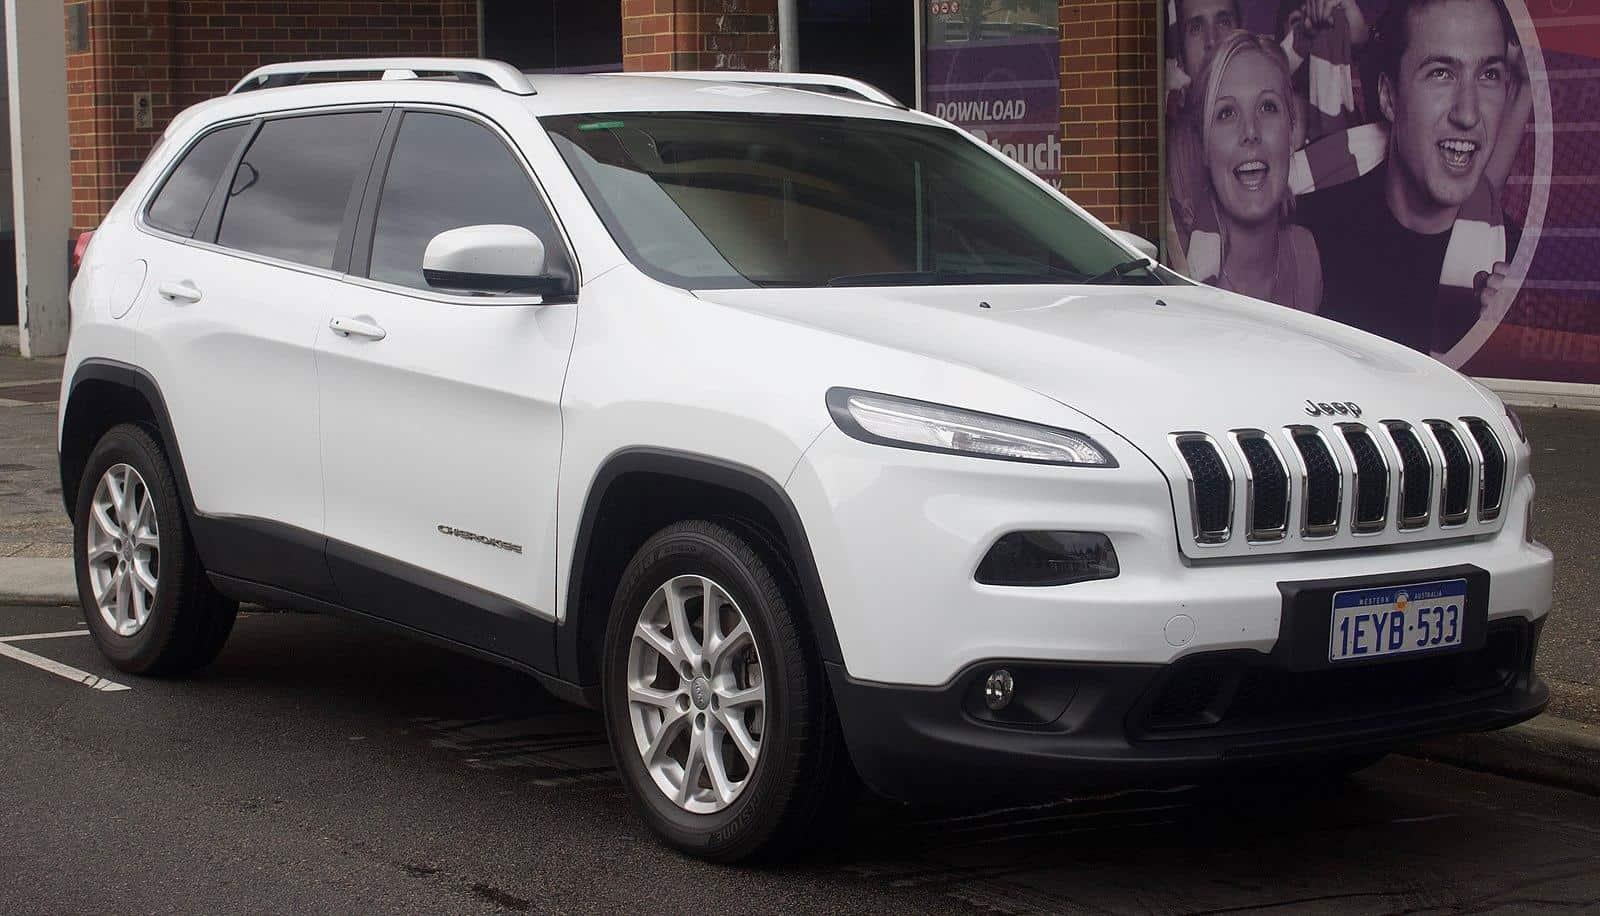 Jeep CherokeeXJ